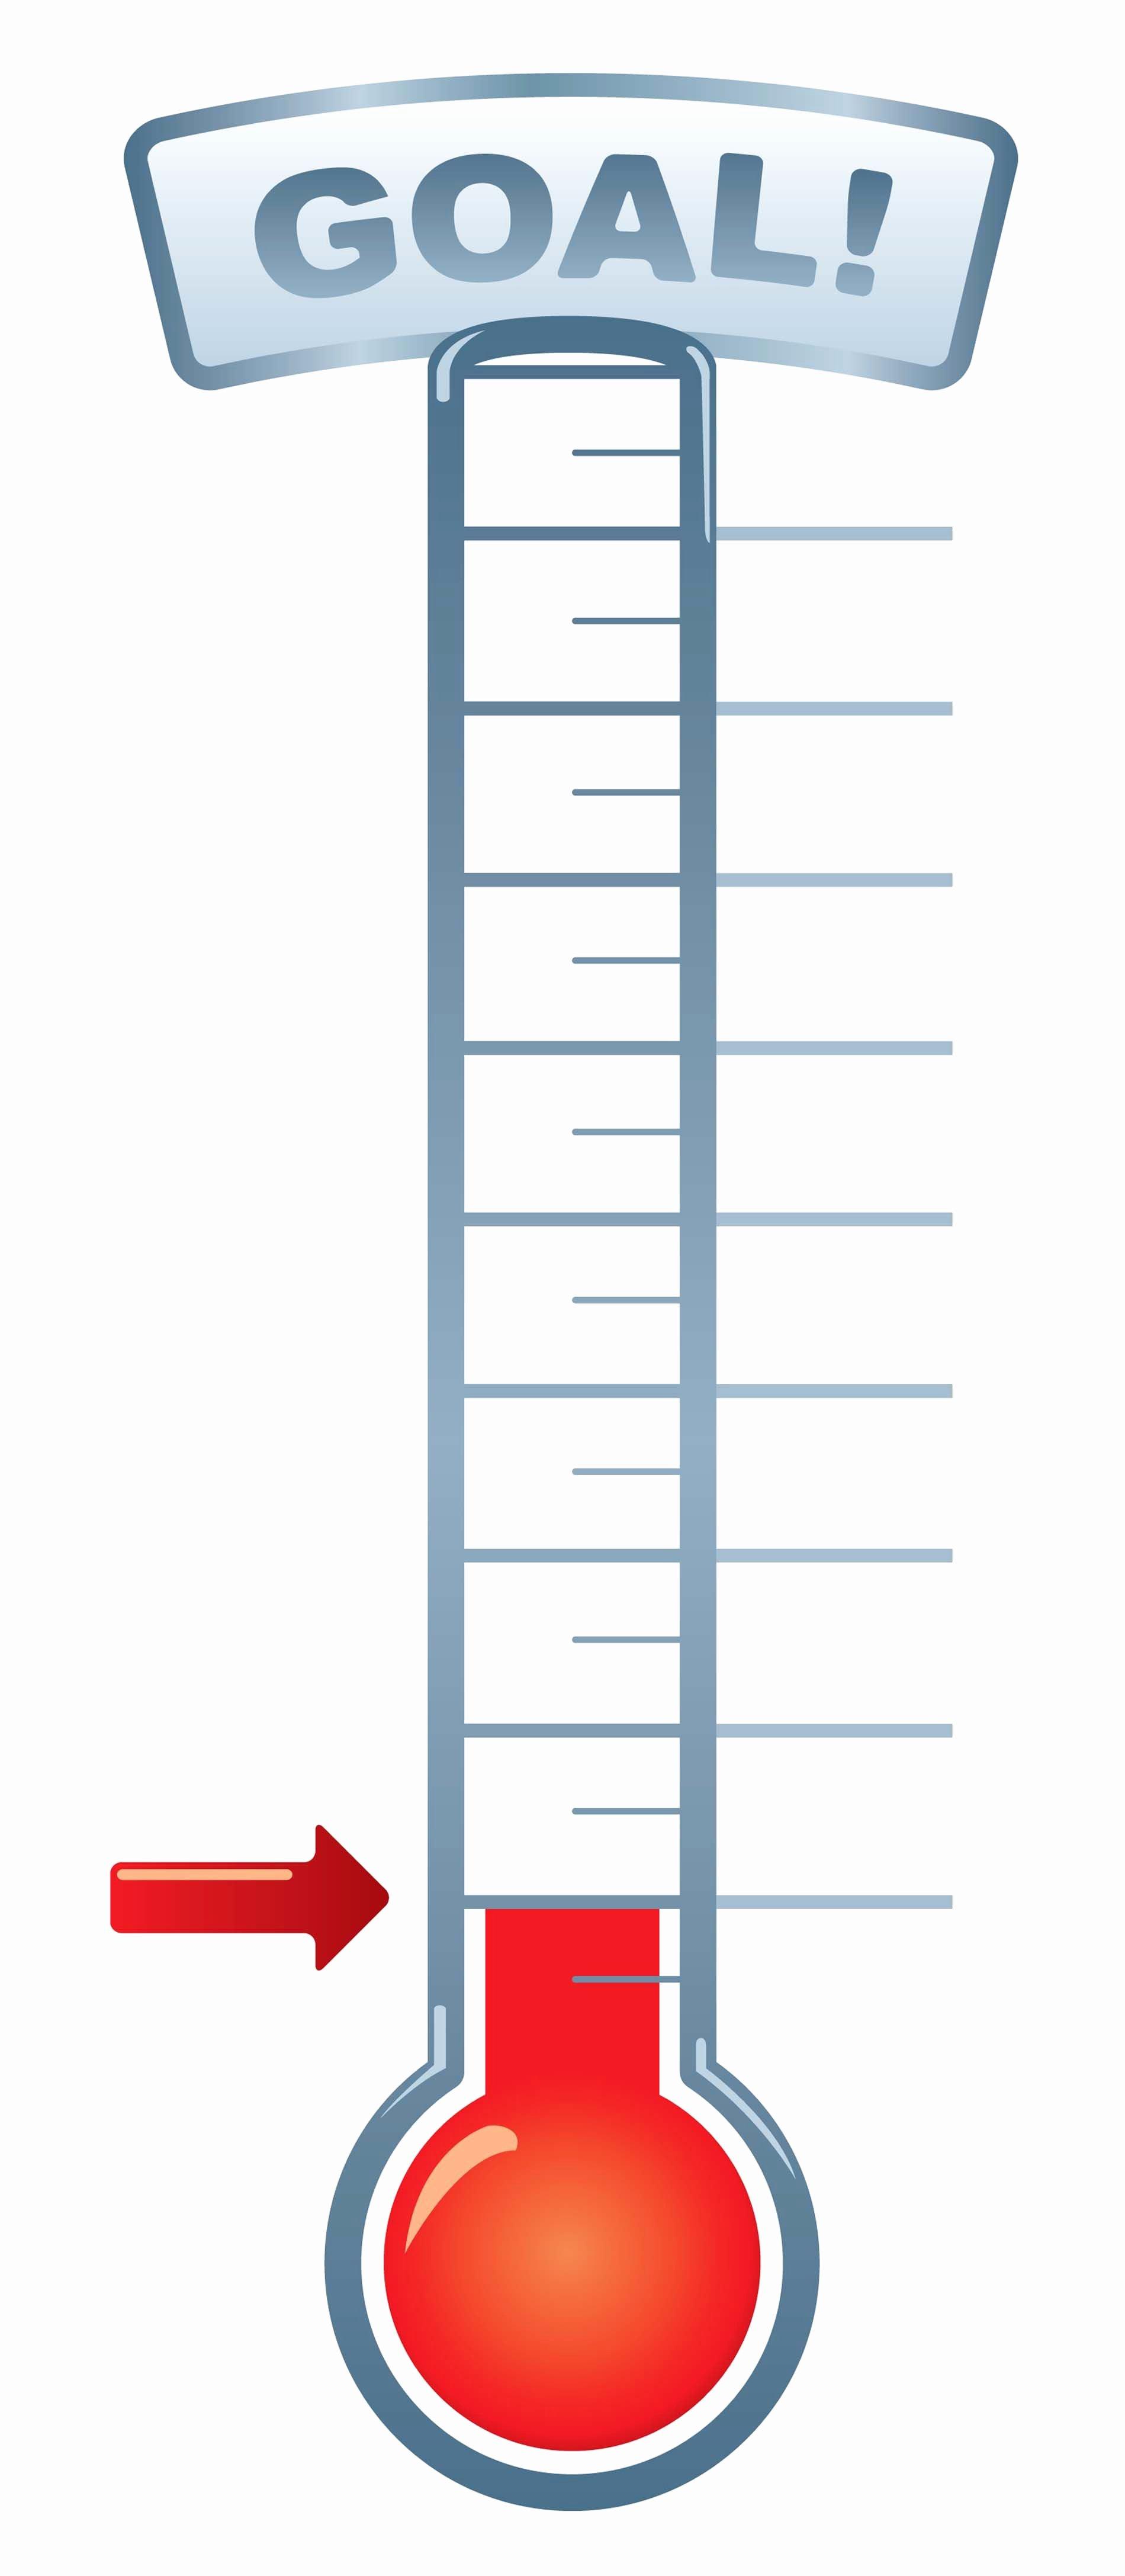 Printable thermometer Goal Chart Lovely Goal thermometer Printable for Clipart 1 900×4 349